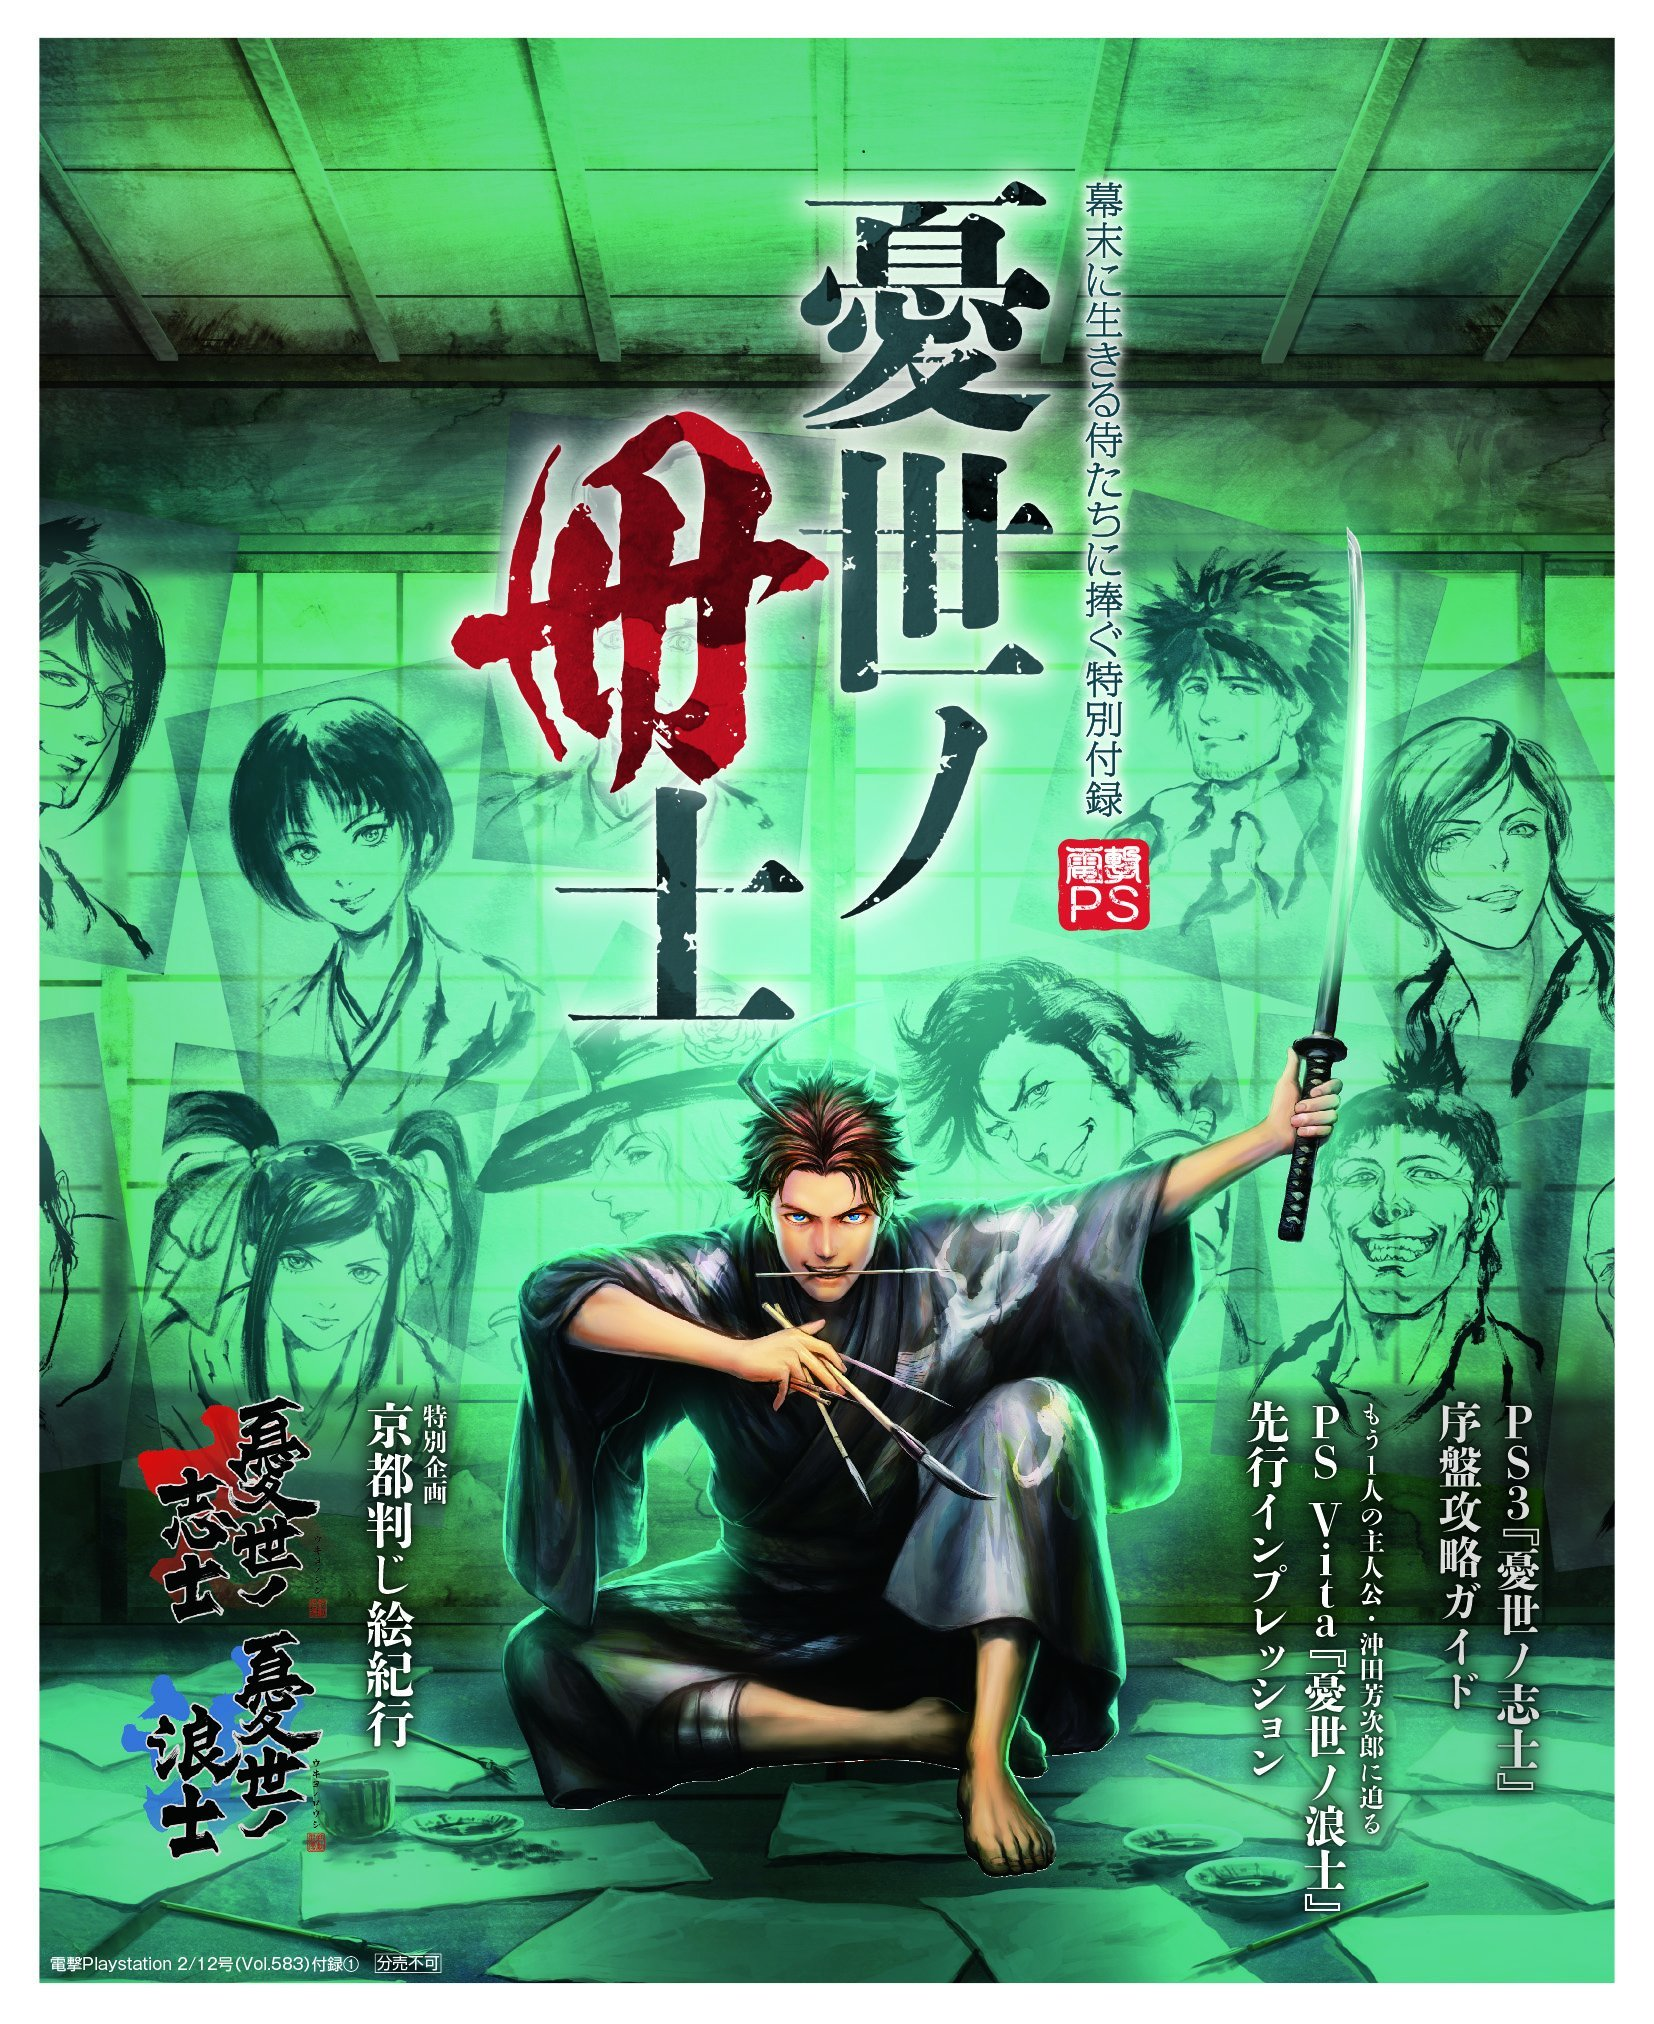 Ukiyo no Roushi guide (Vol.583 supplement) (February 12, 2015)